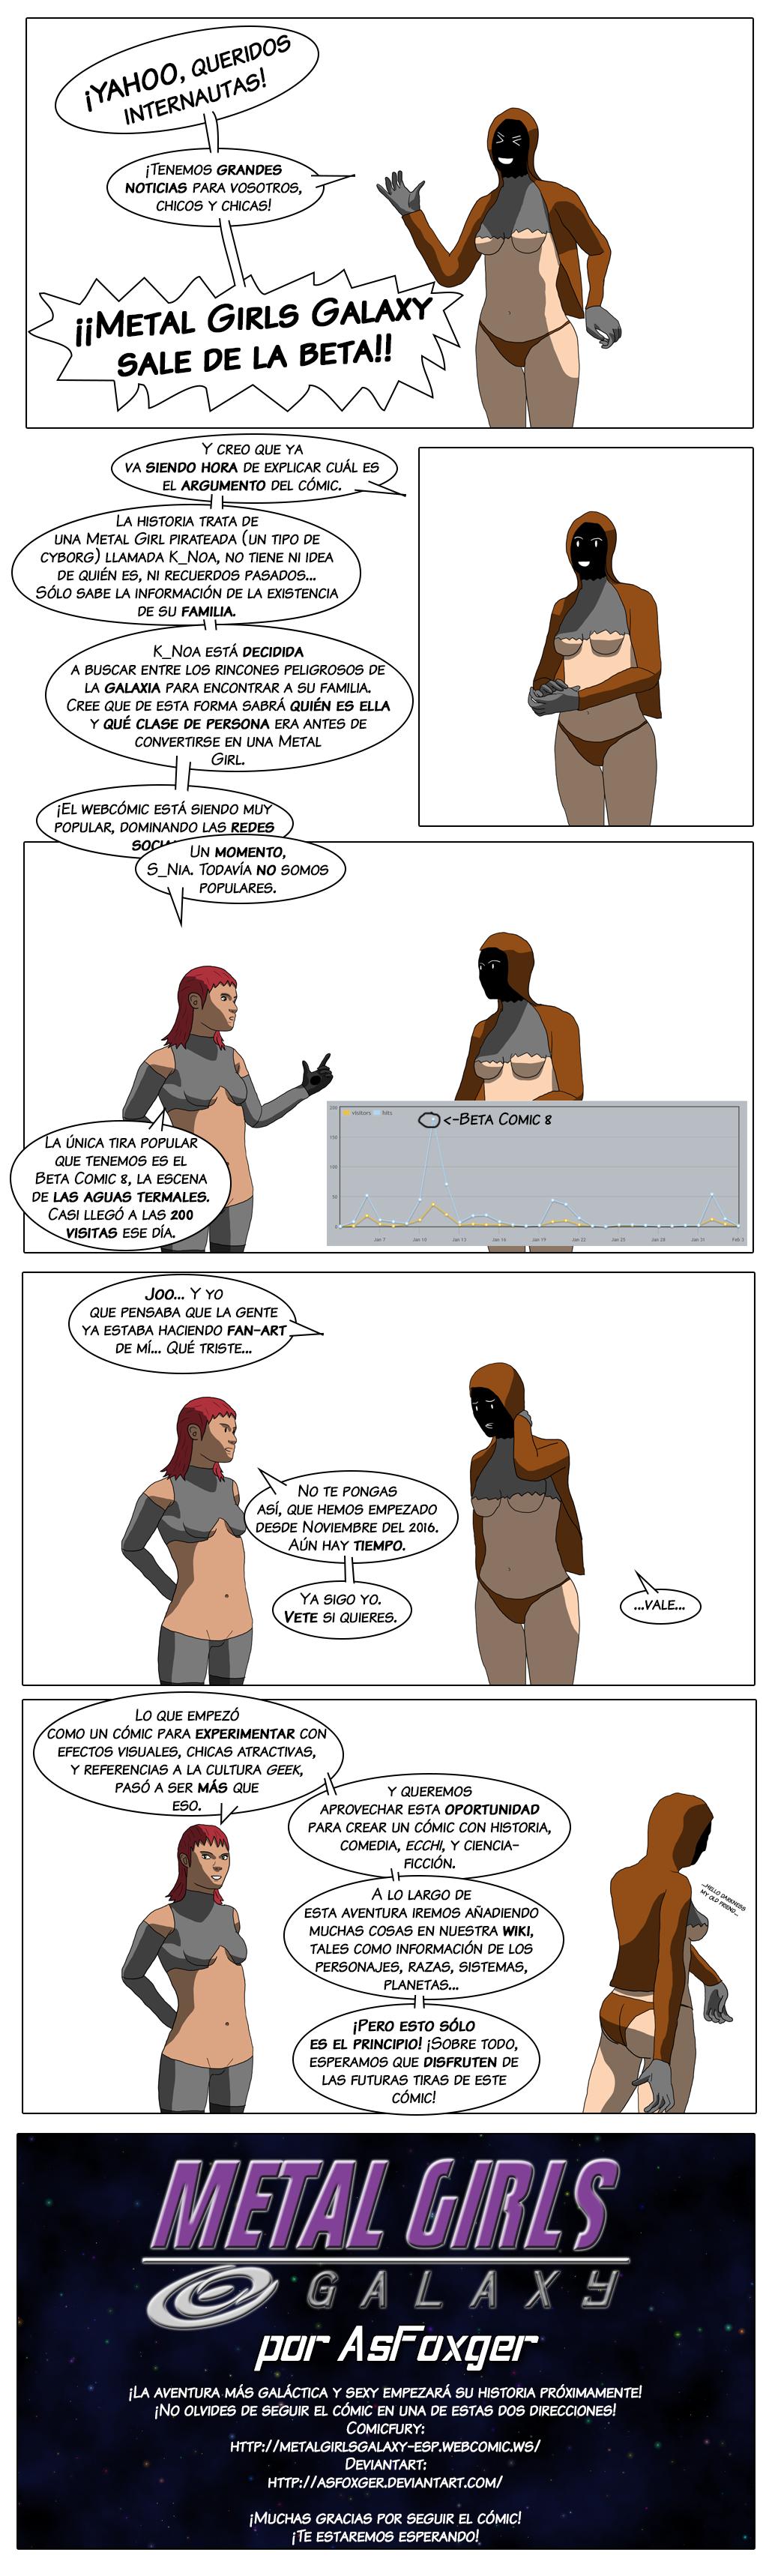 Final Beta Comic 11